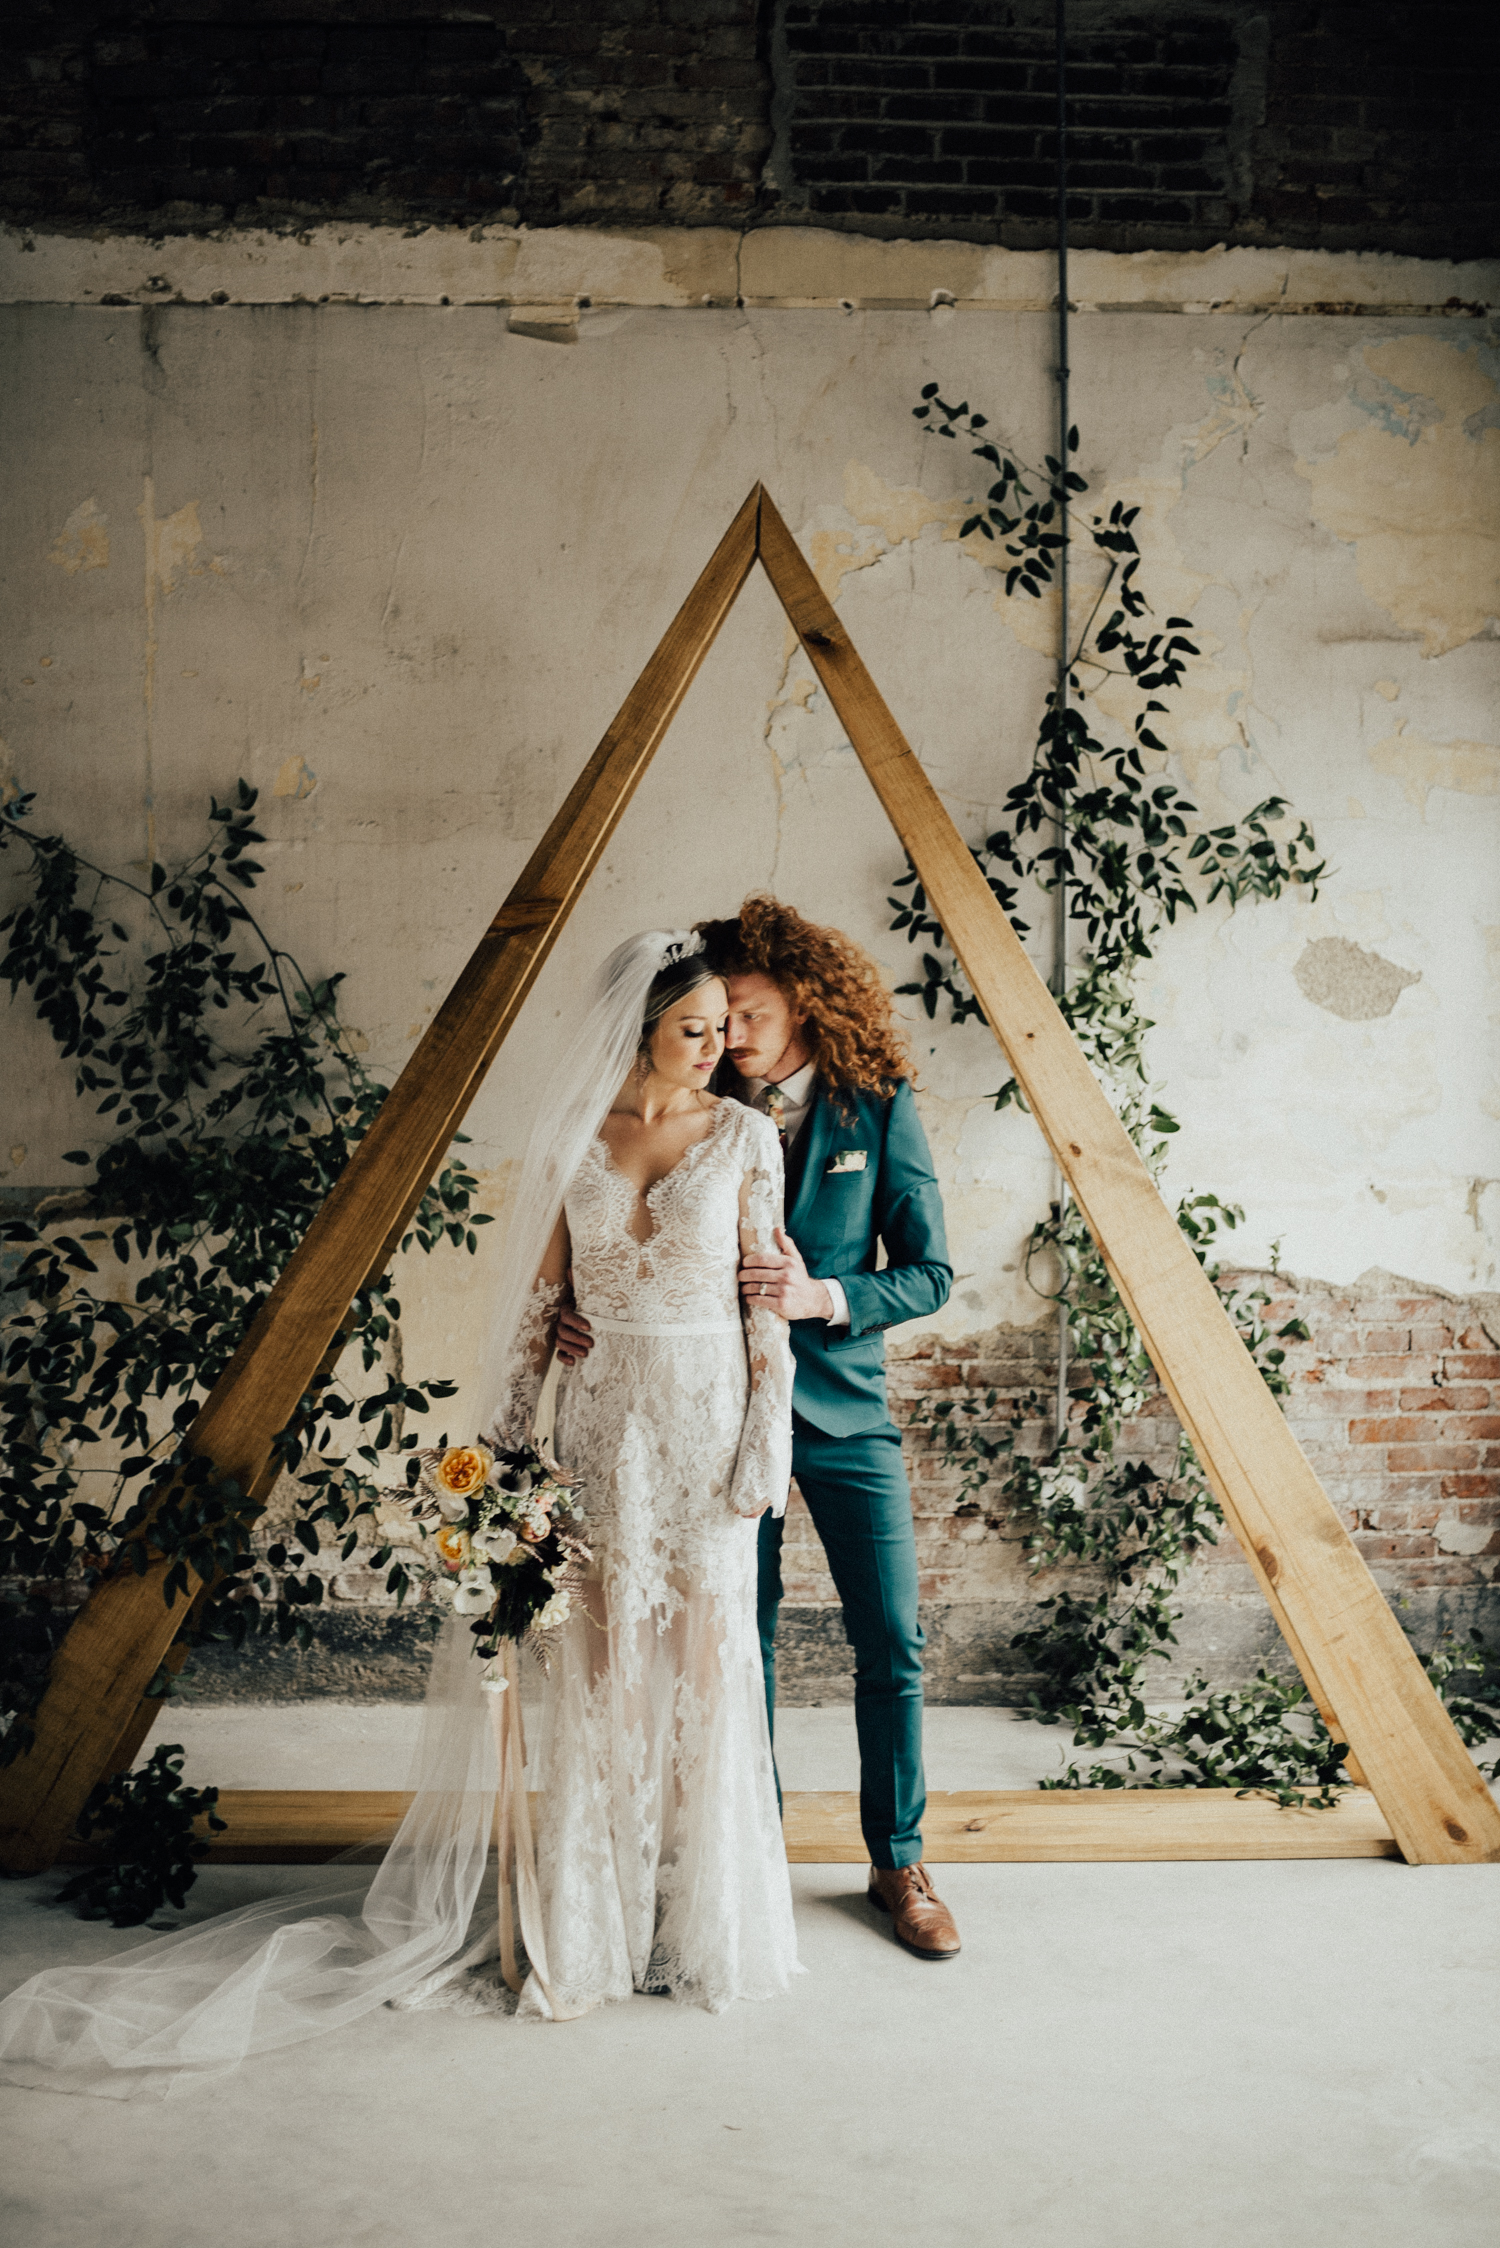 St-Louis-wedding-photographers-82.jpg